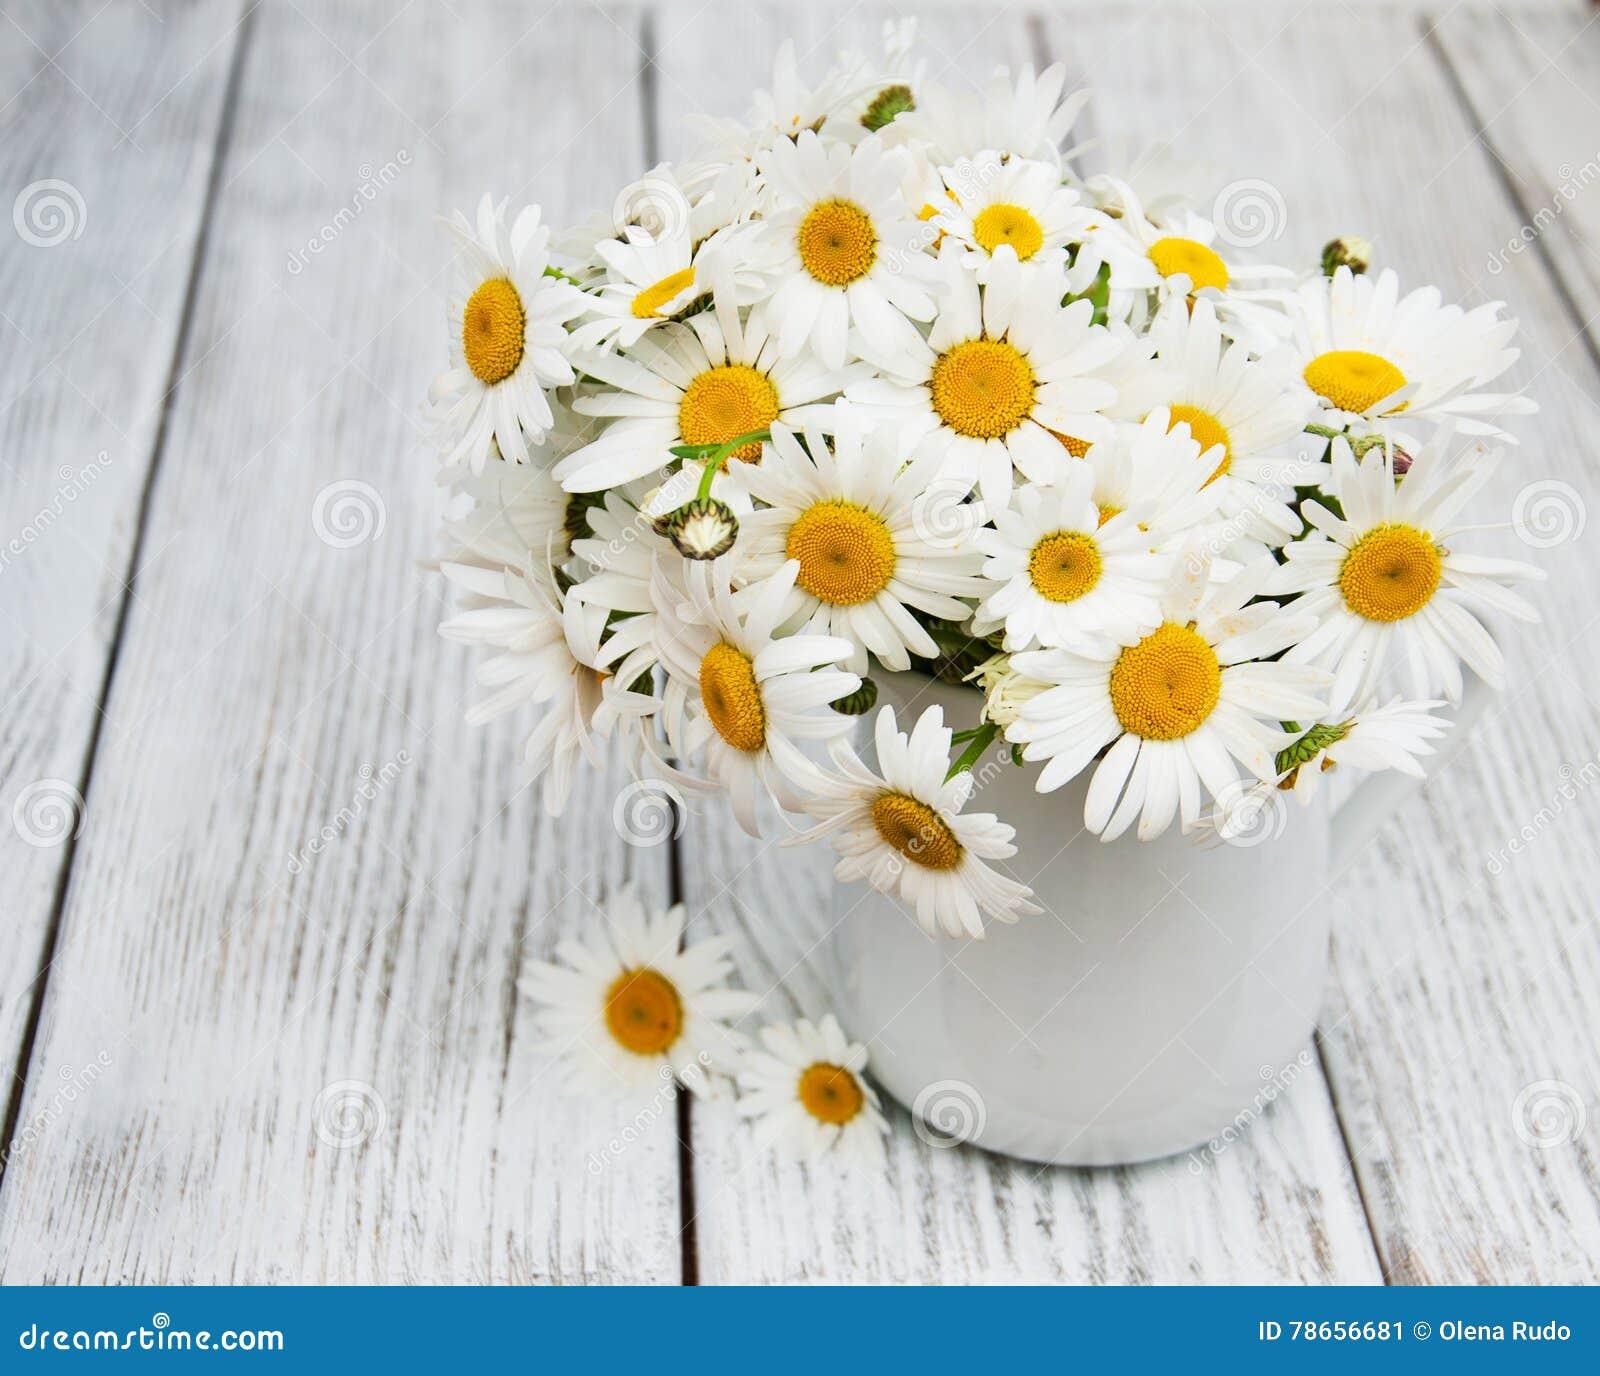 Daisies in vase stock image image of flora beauty bloom 78656681 daisies in vase reviewsmspy